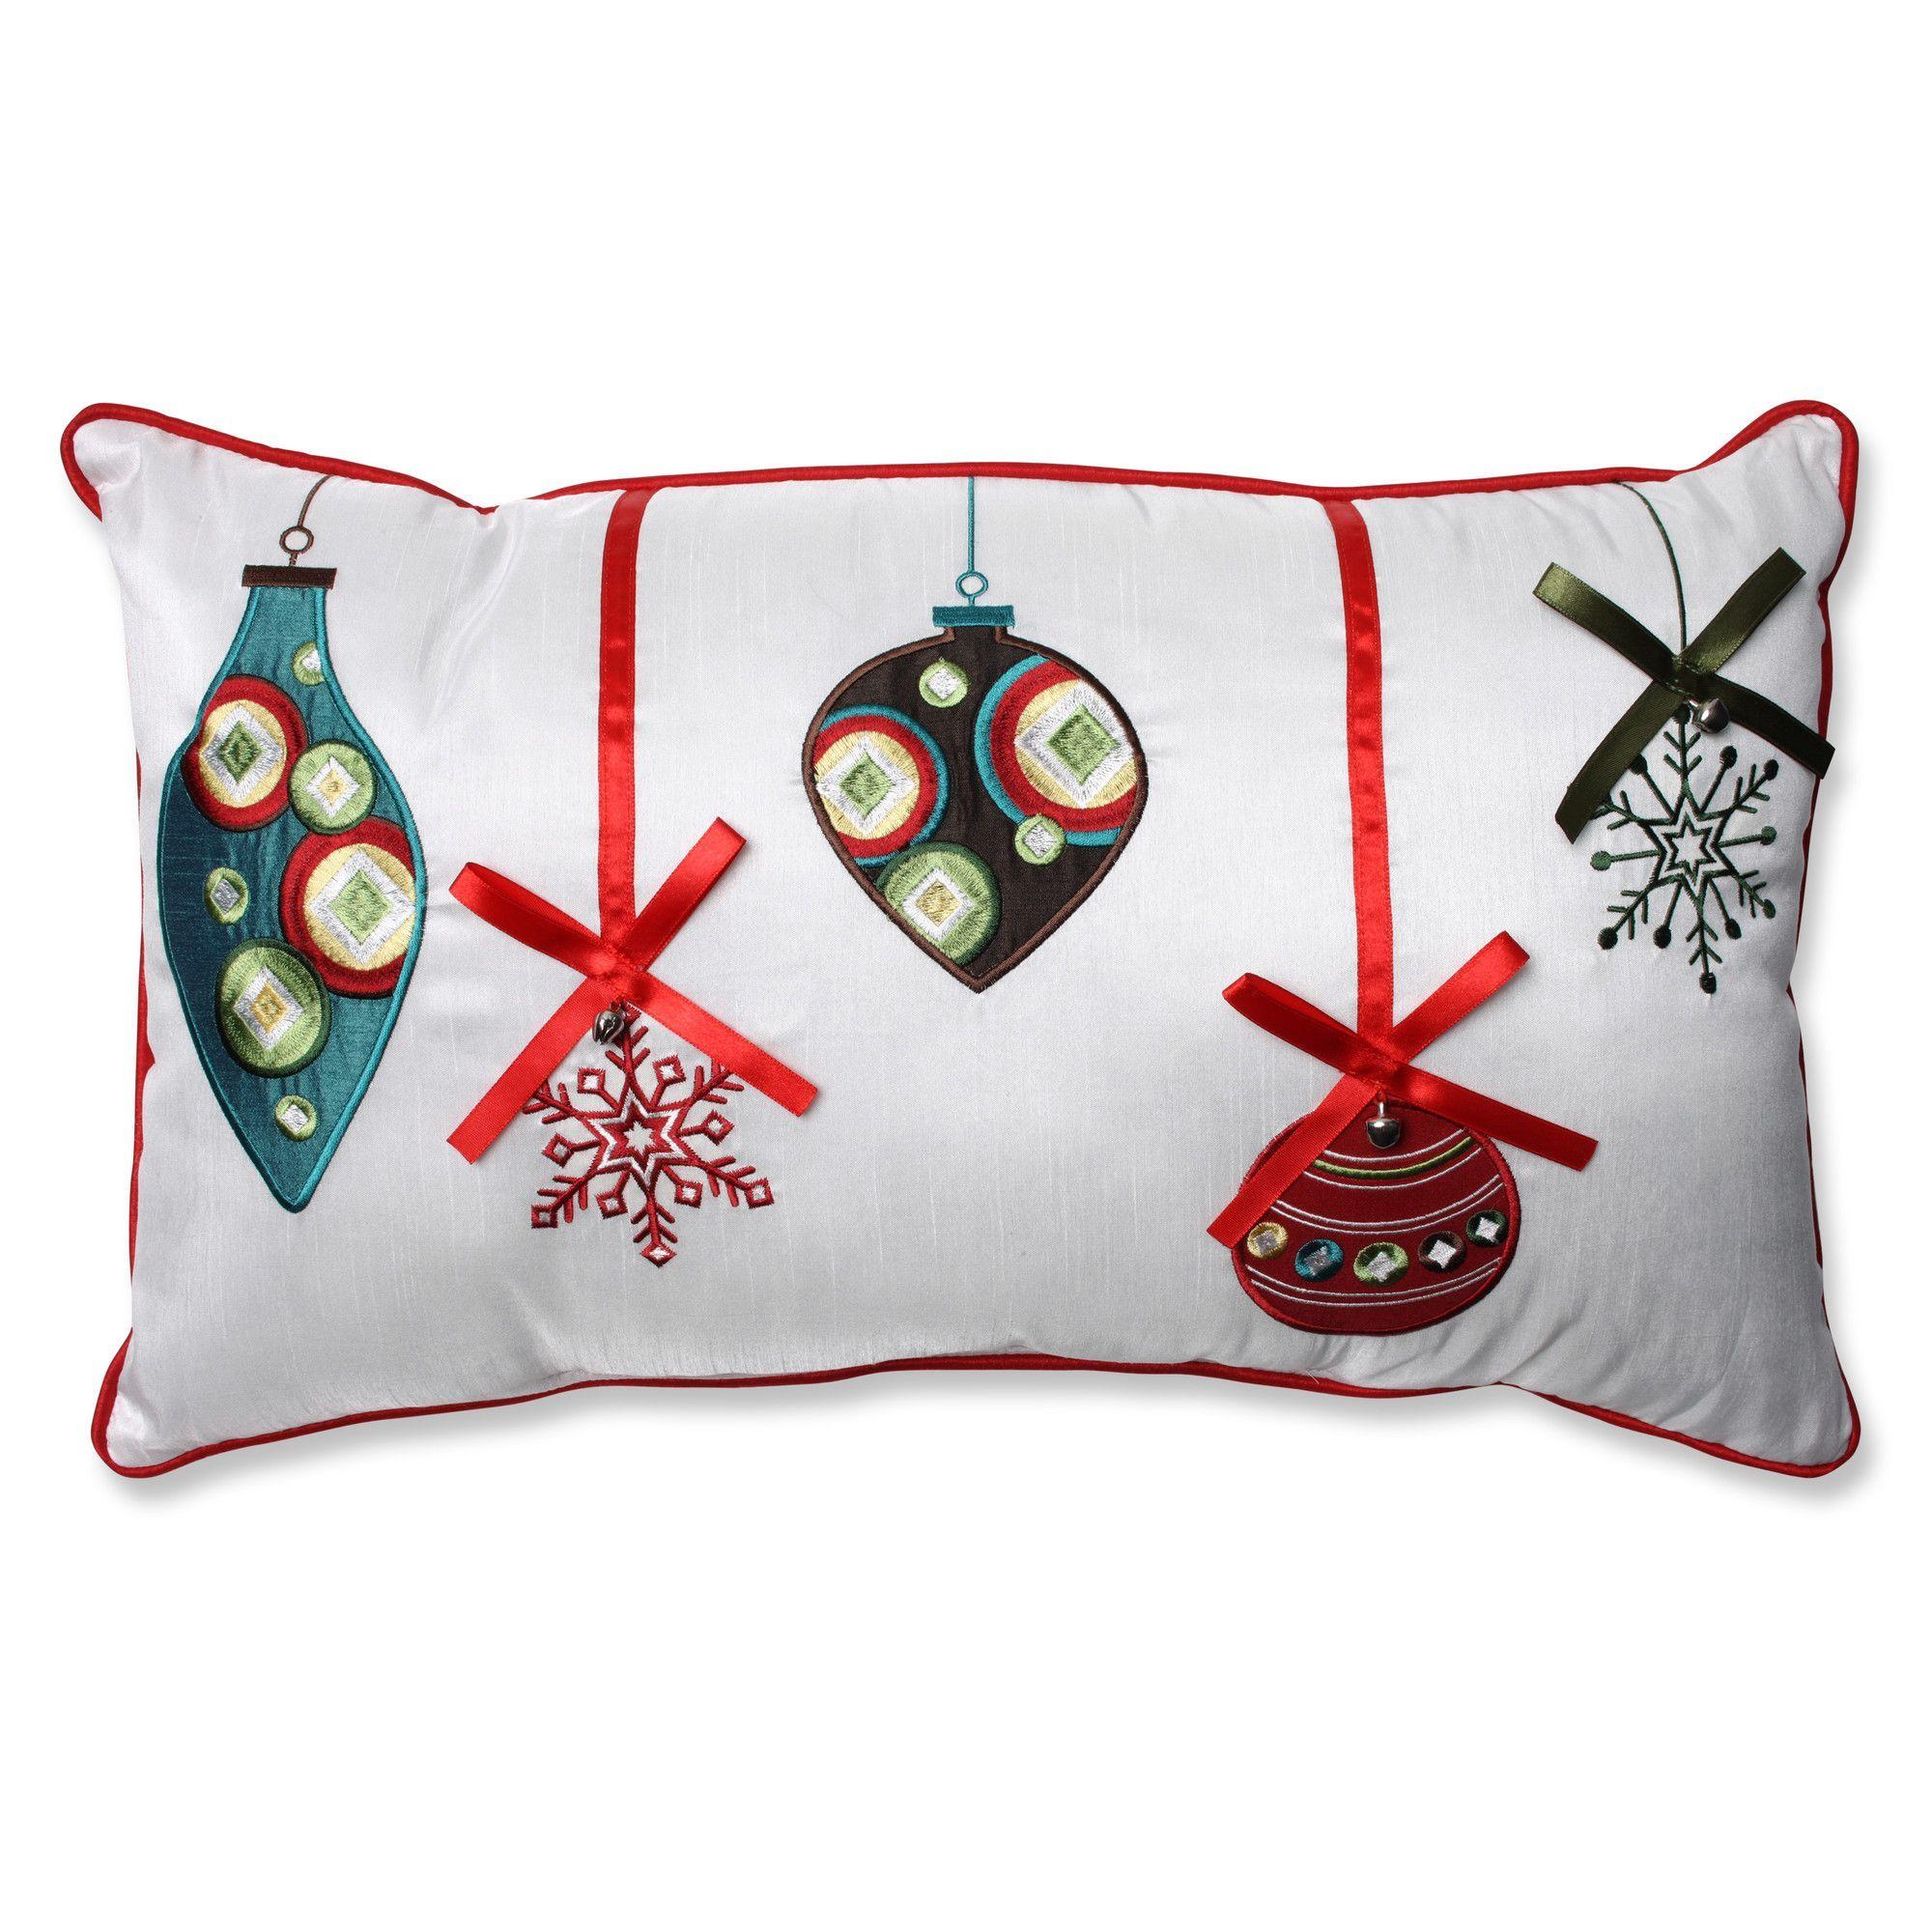 Pillow Perfect Holiday Ornaments Lumbar Pillow | AllModern